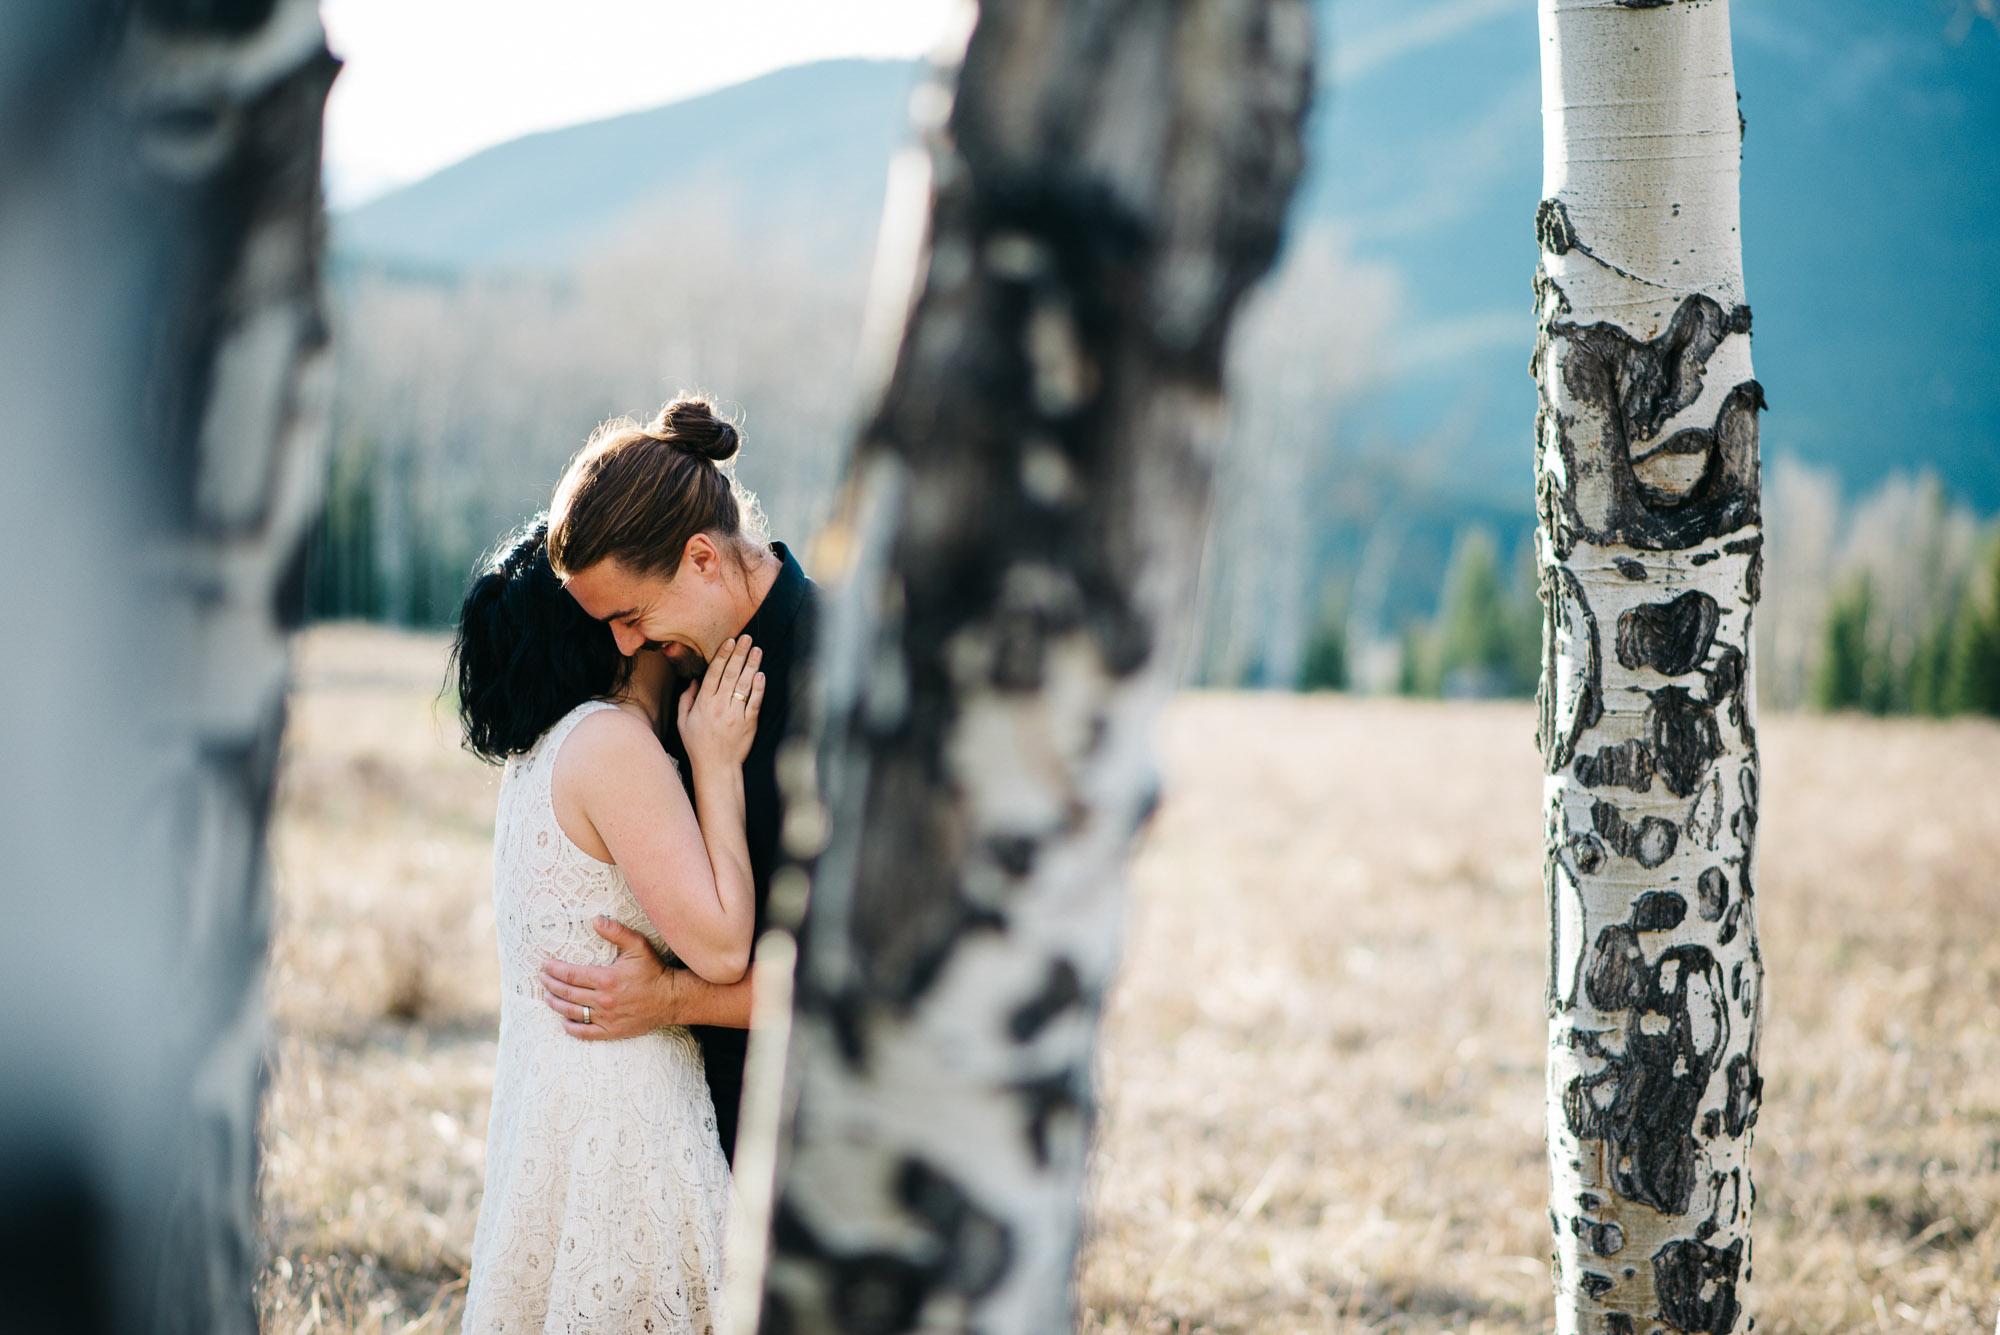 40-39couple-anniversary-engagement-photographer-colorado-romantic-photos-mountain-wedding-photographer-trevr&marissa-2016-2591.jpg